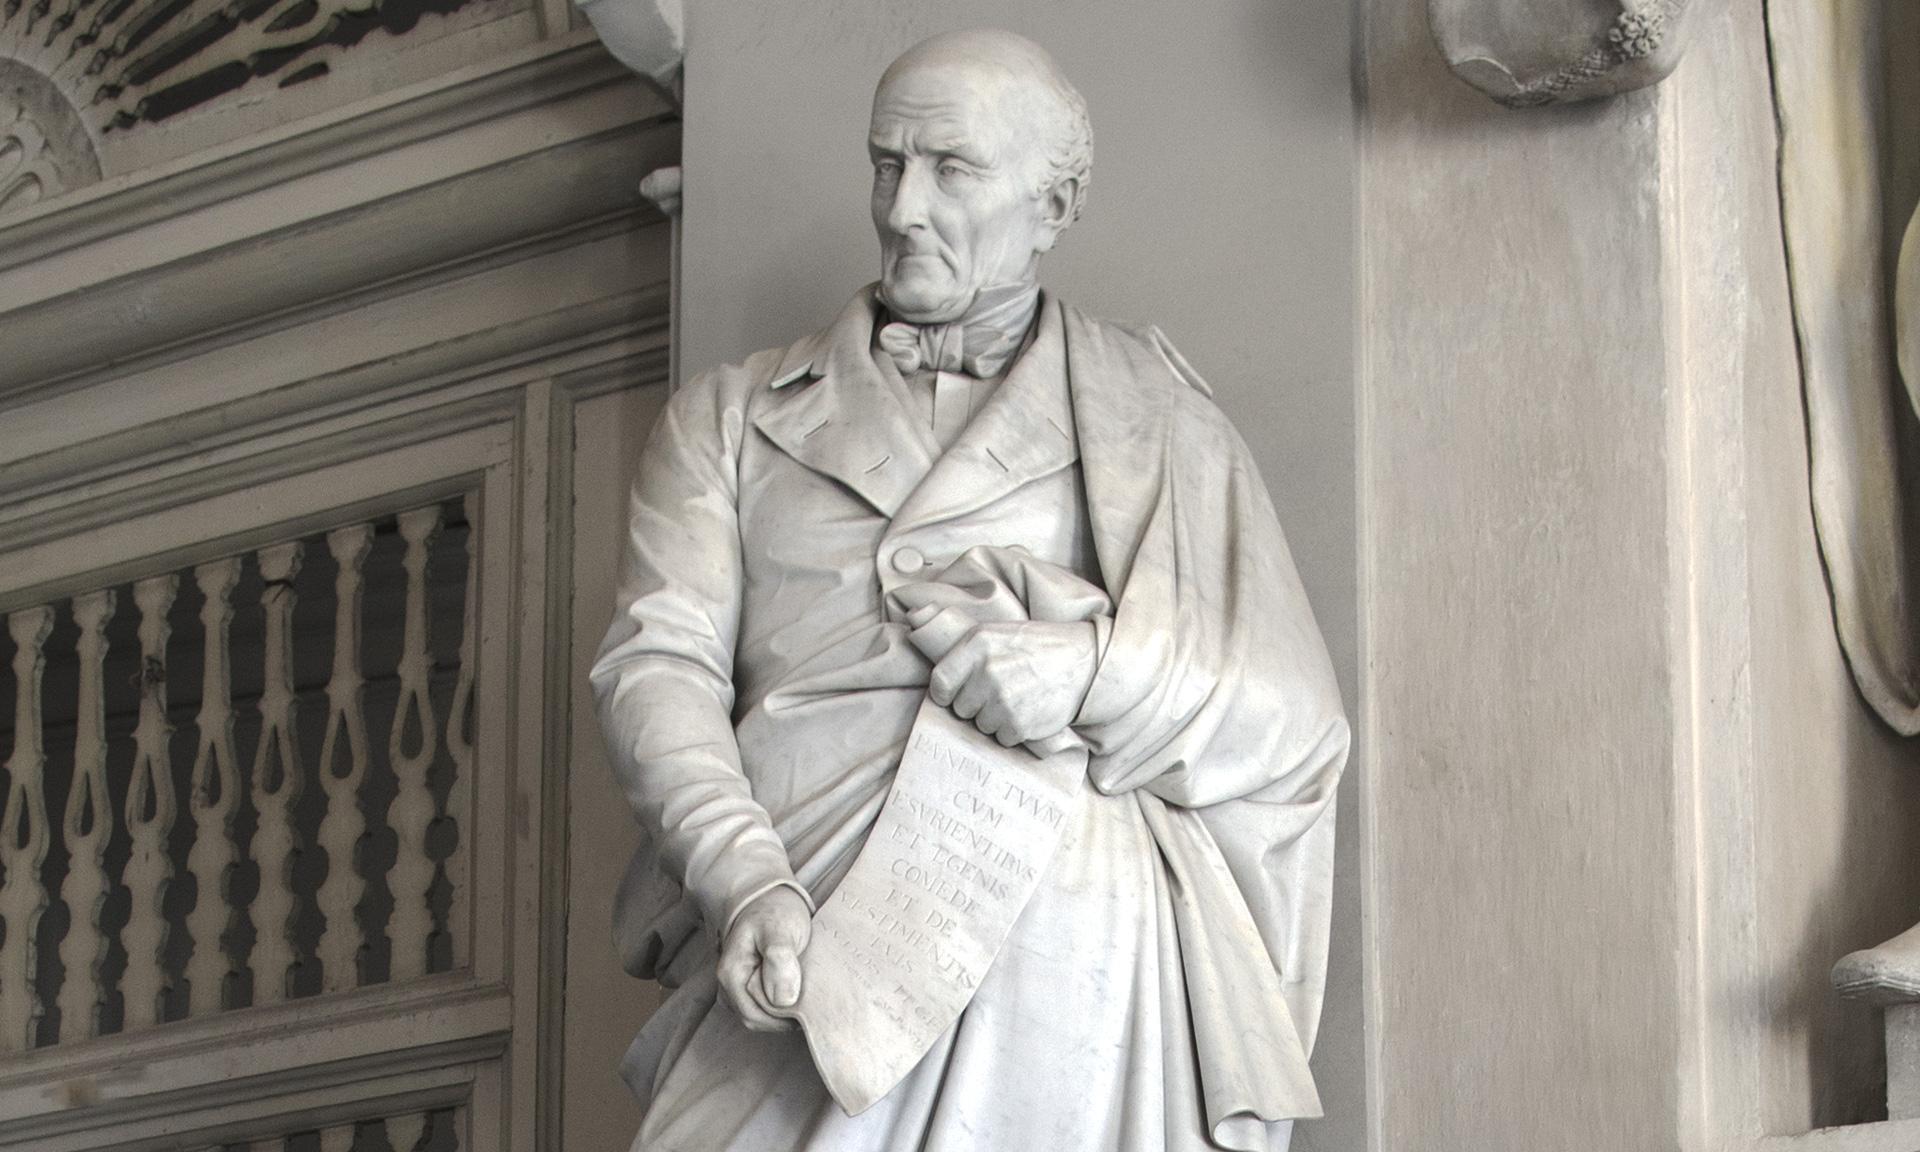 statue_iosephi-puti_01 - Albergo dei Poveri Genova